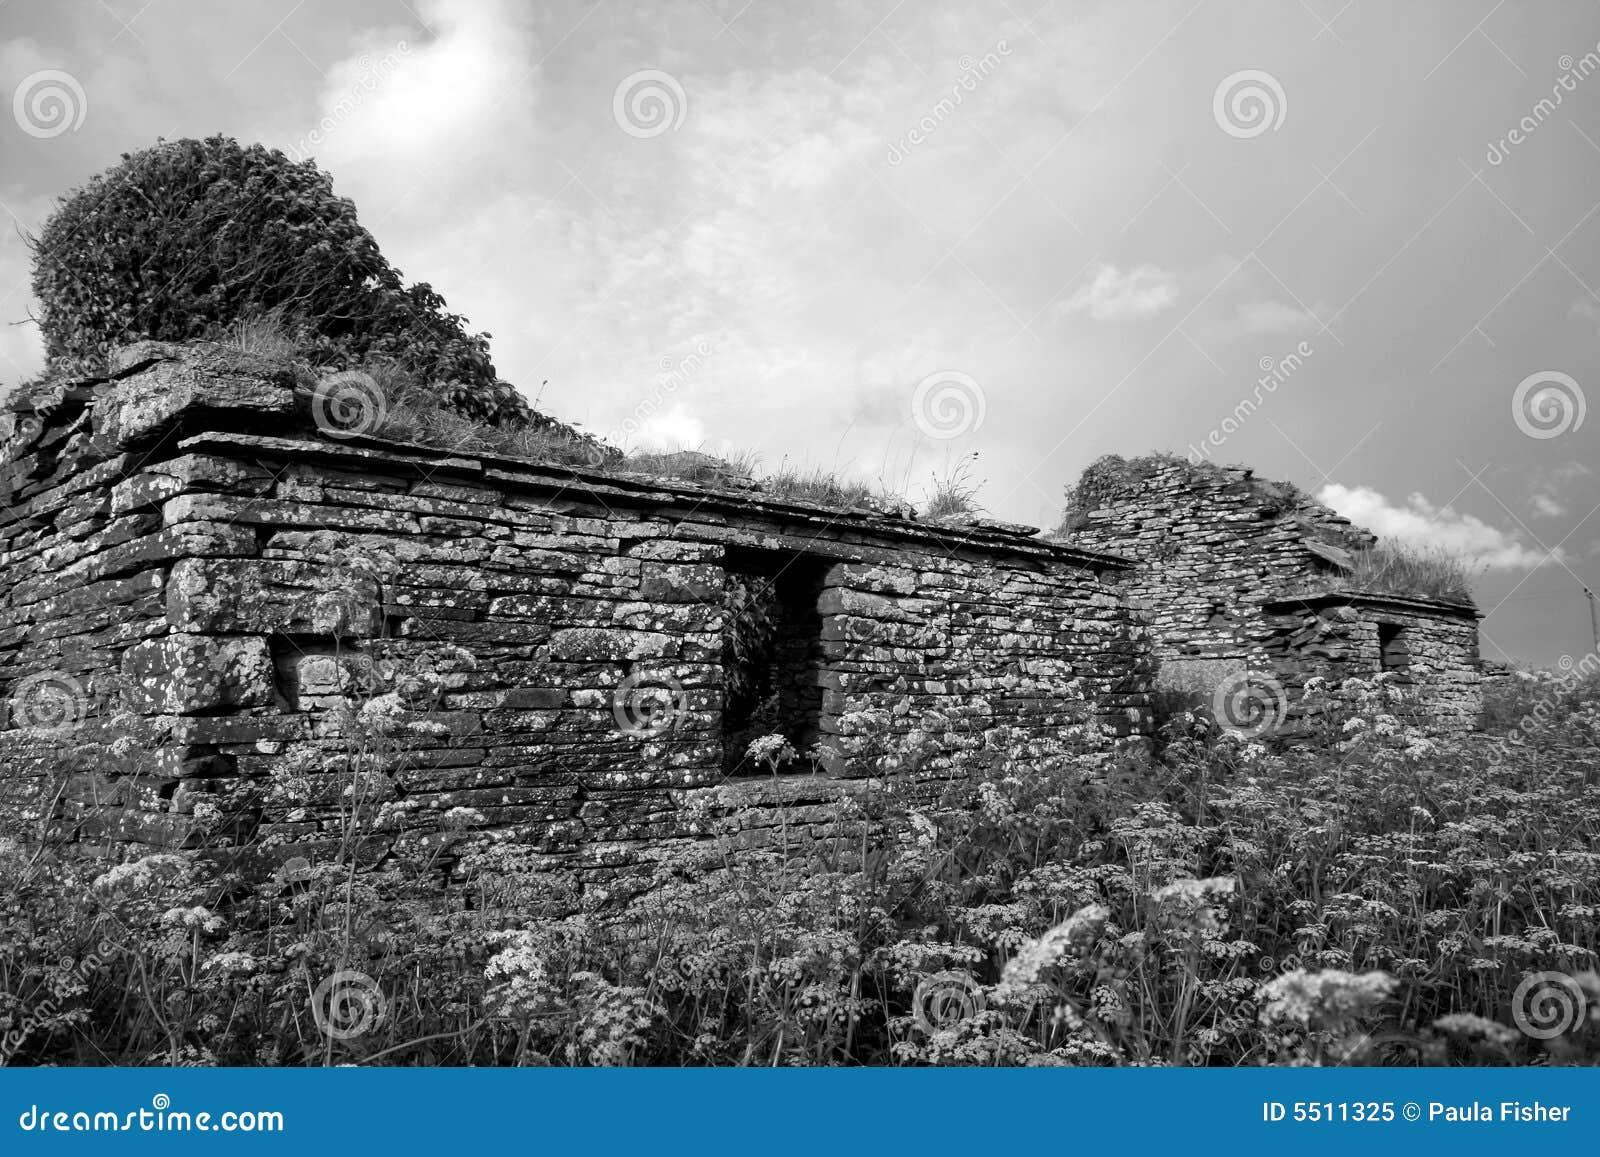 Abandoned Croft House